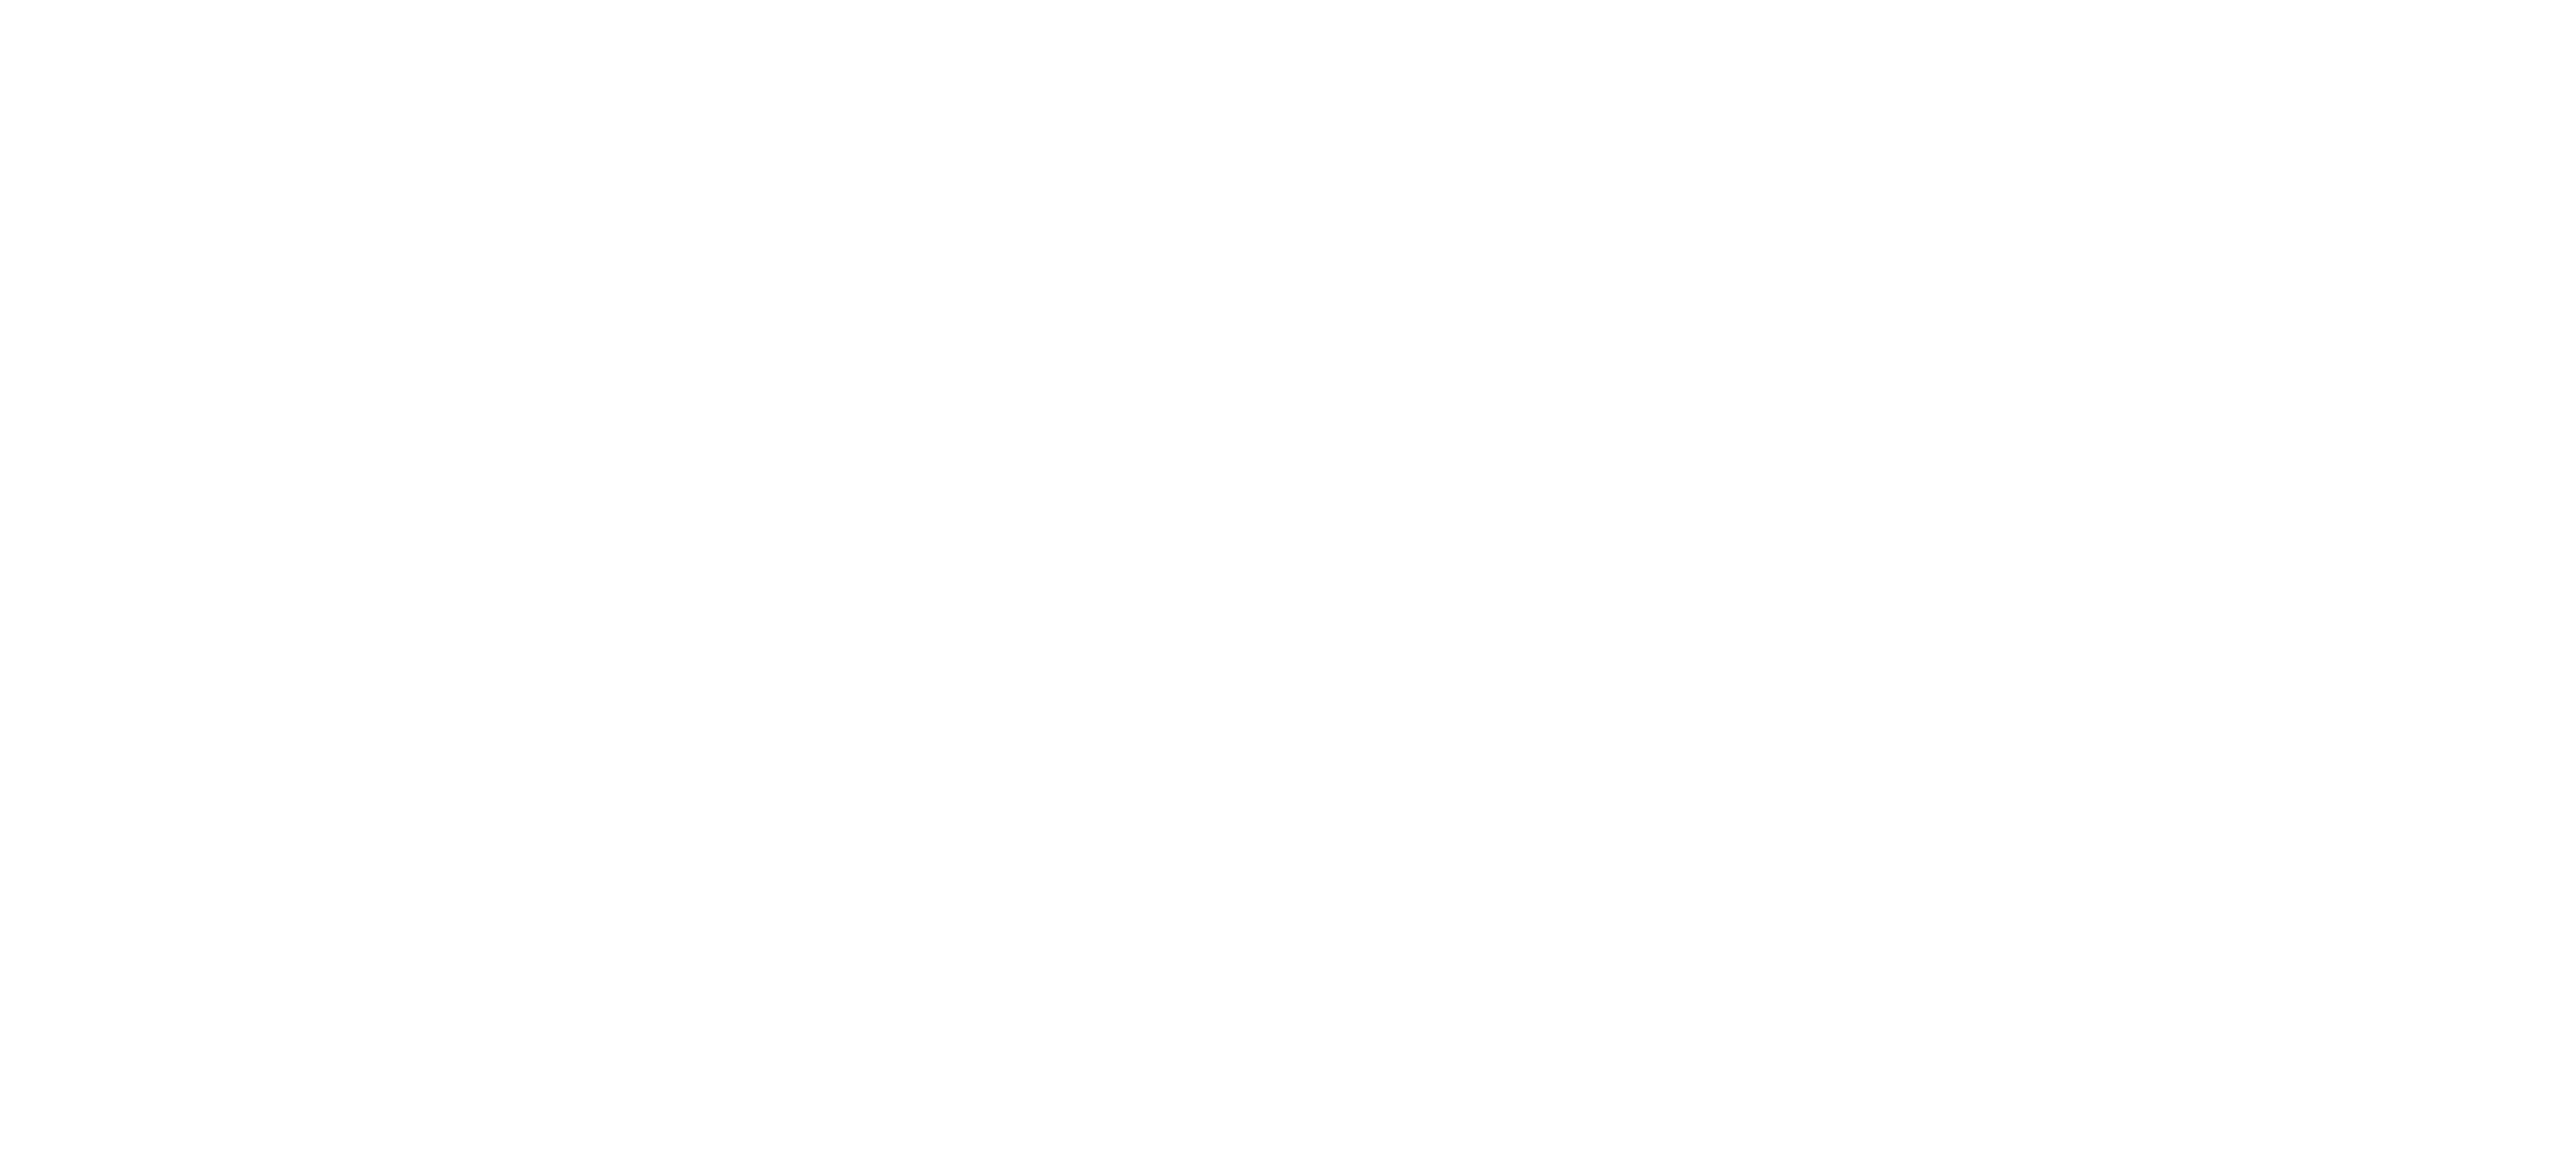 bmft_graph1